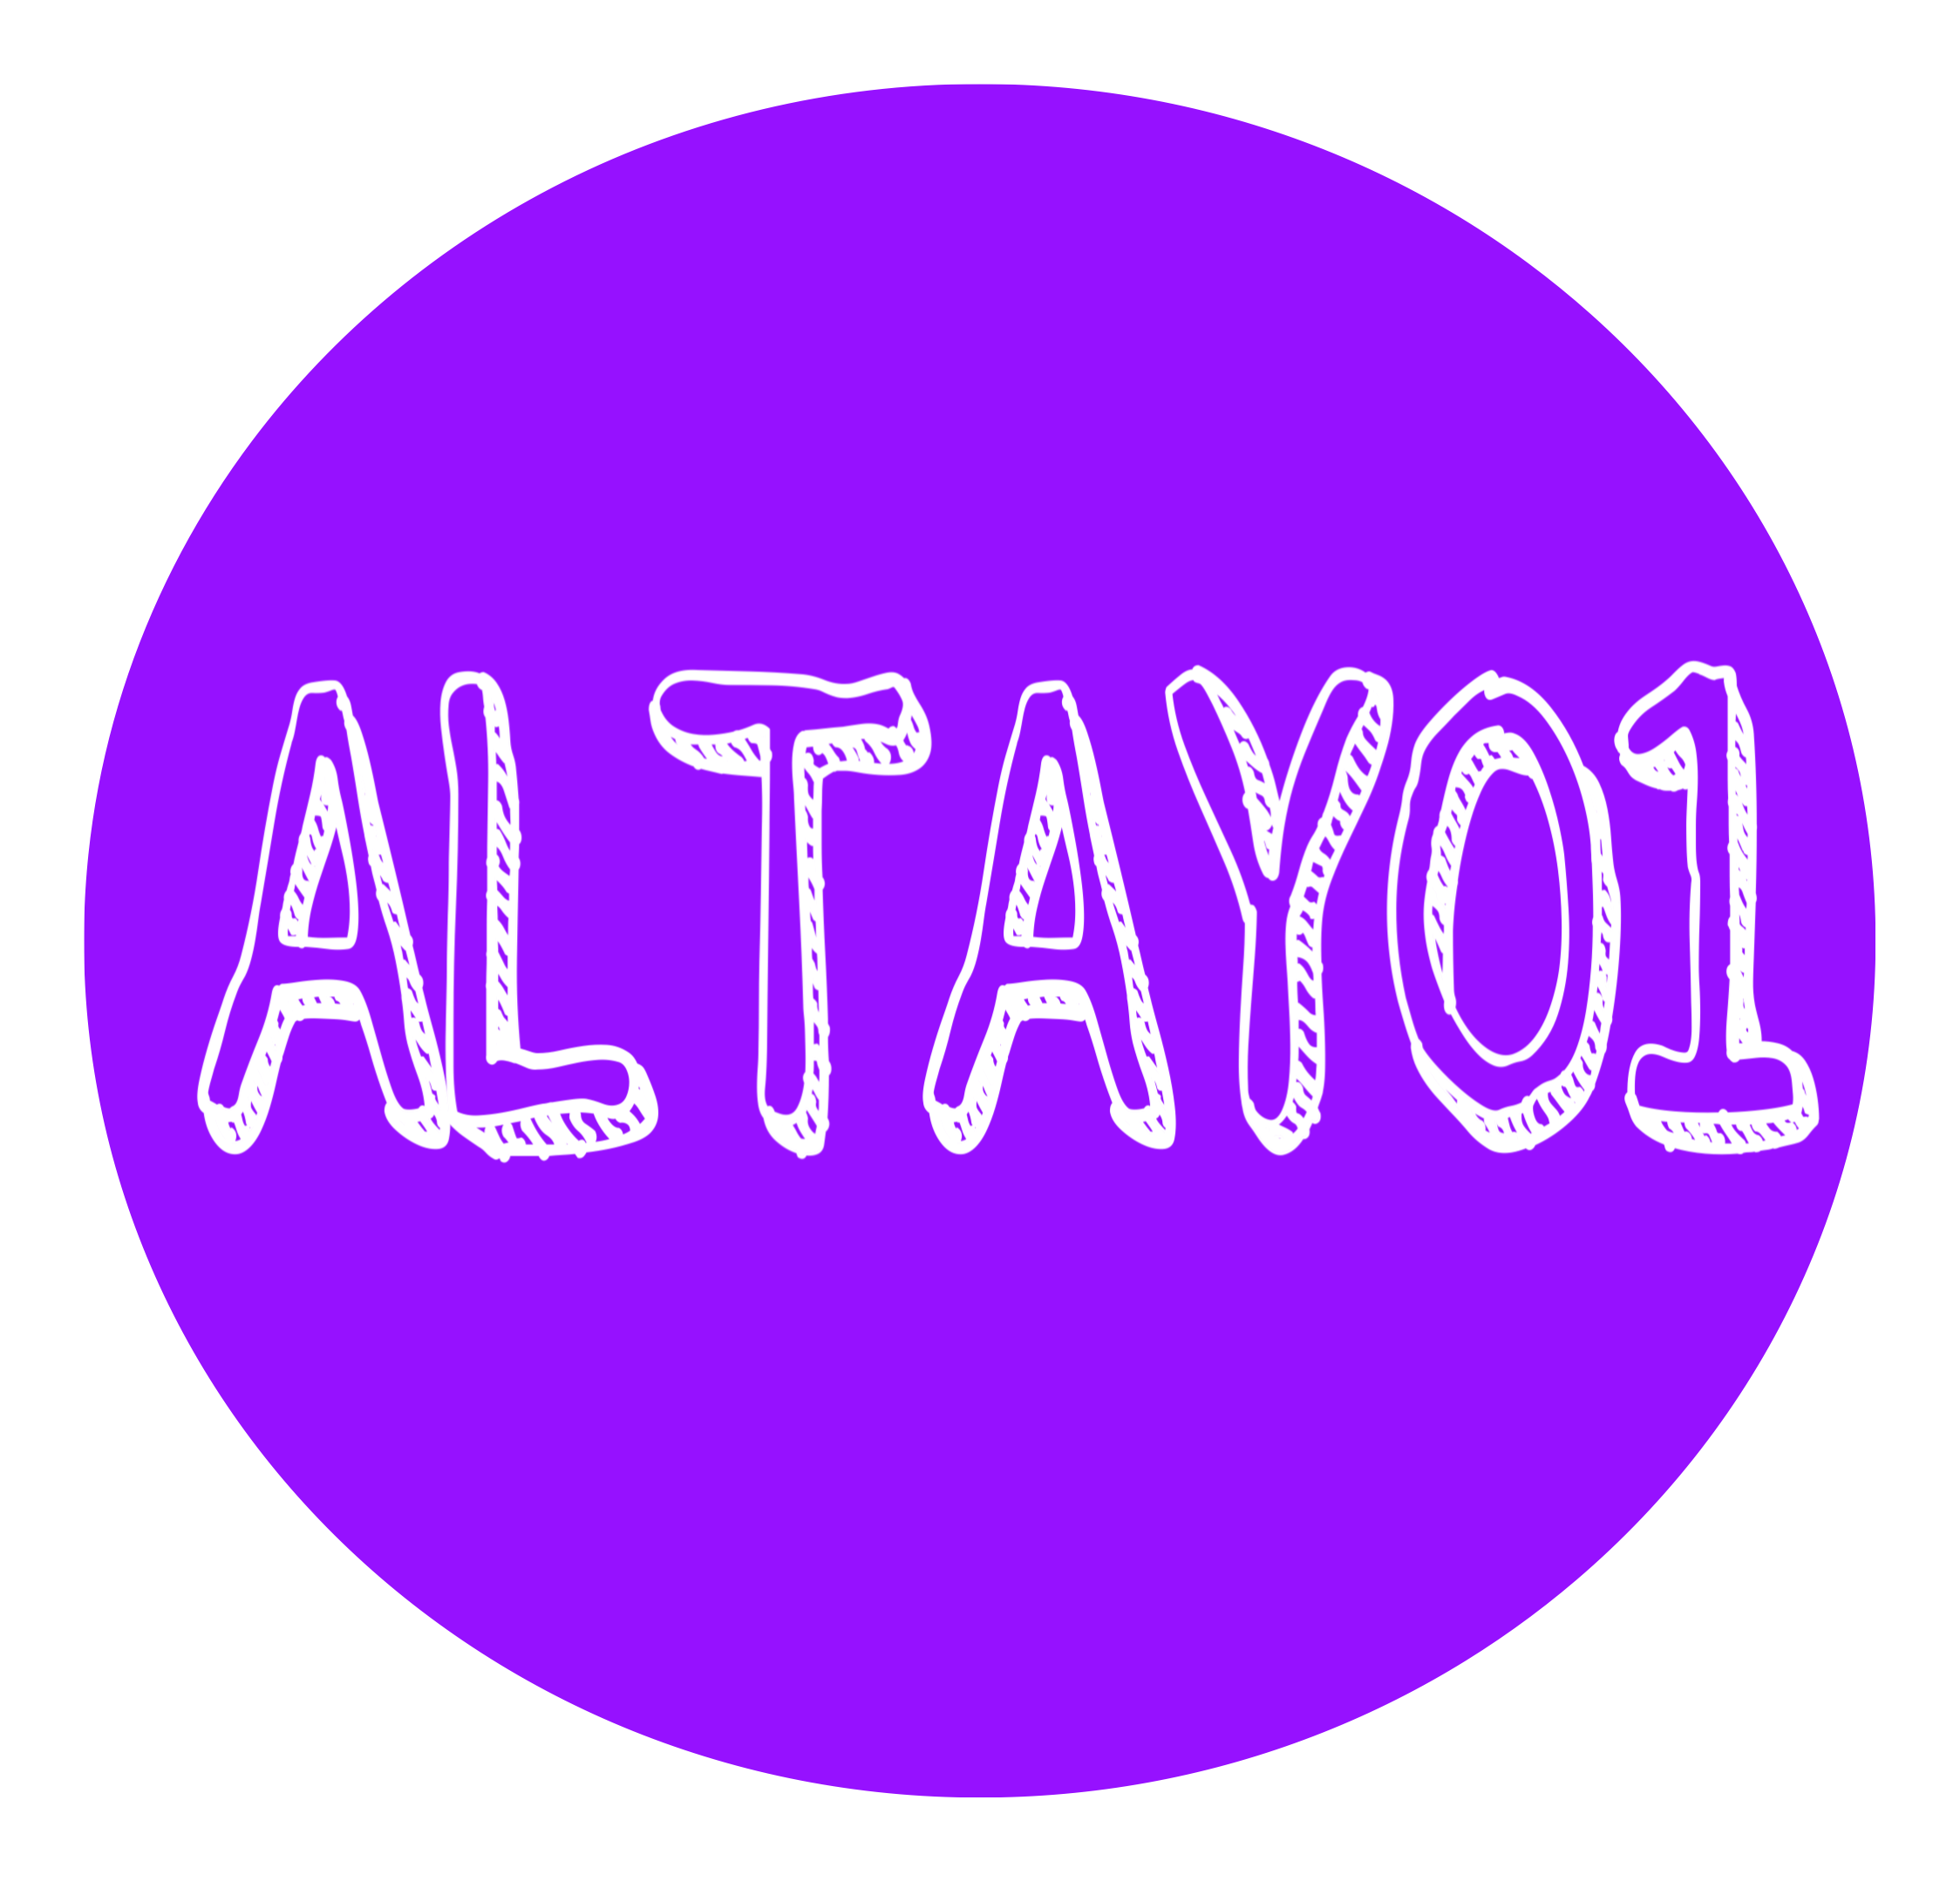 Altay01